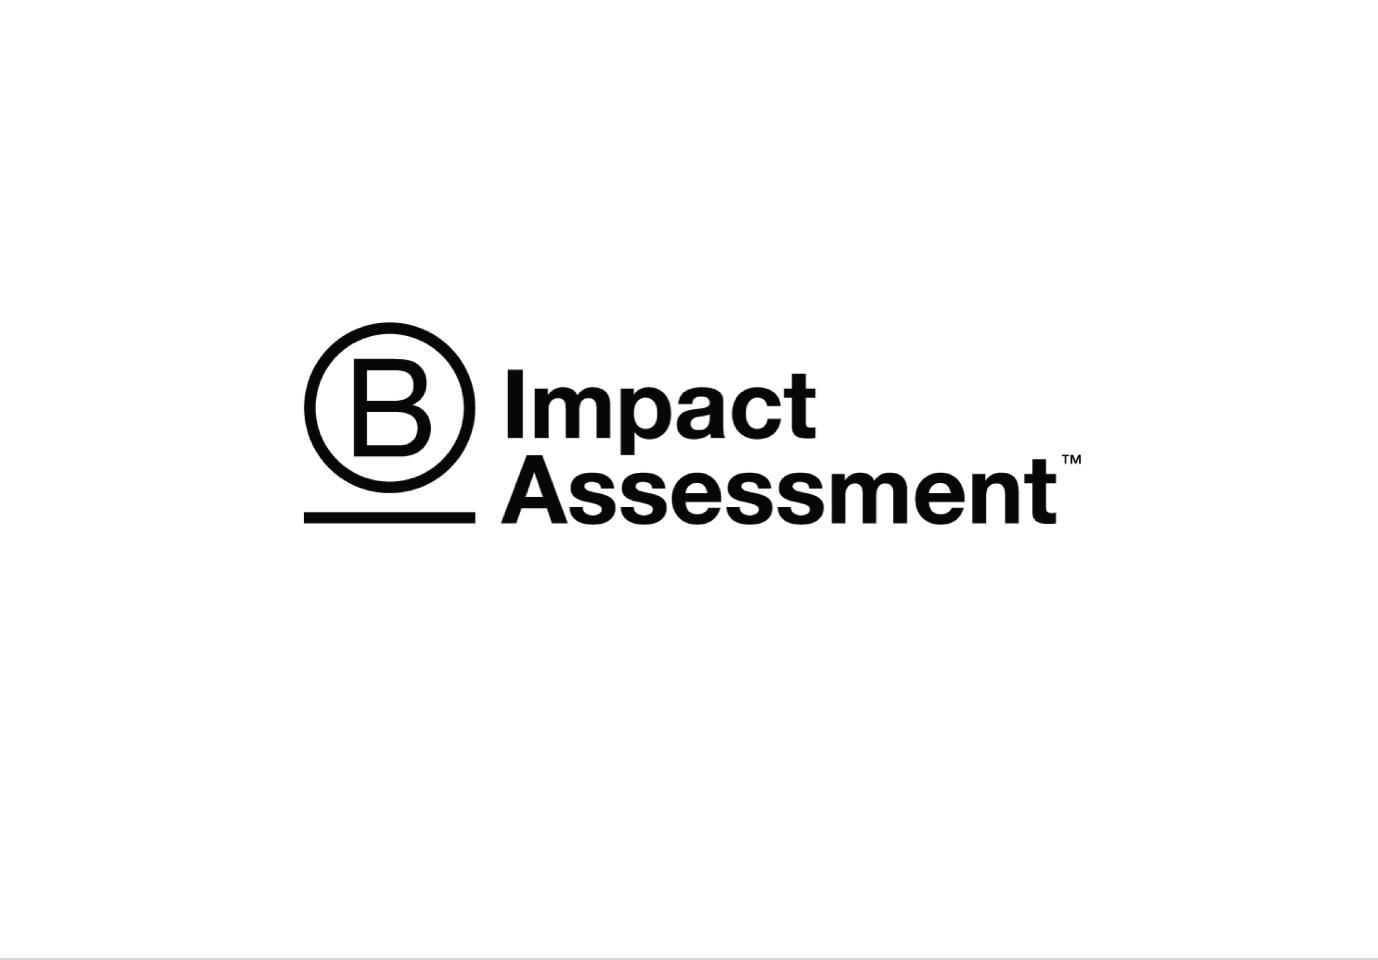 B Impact Discovery